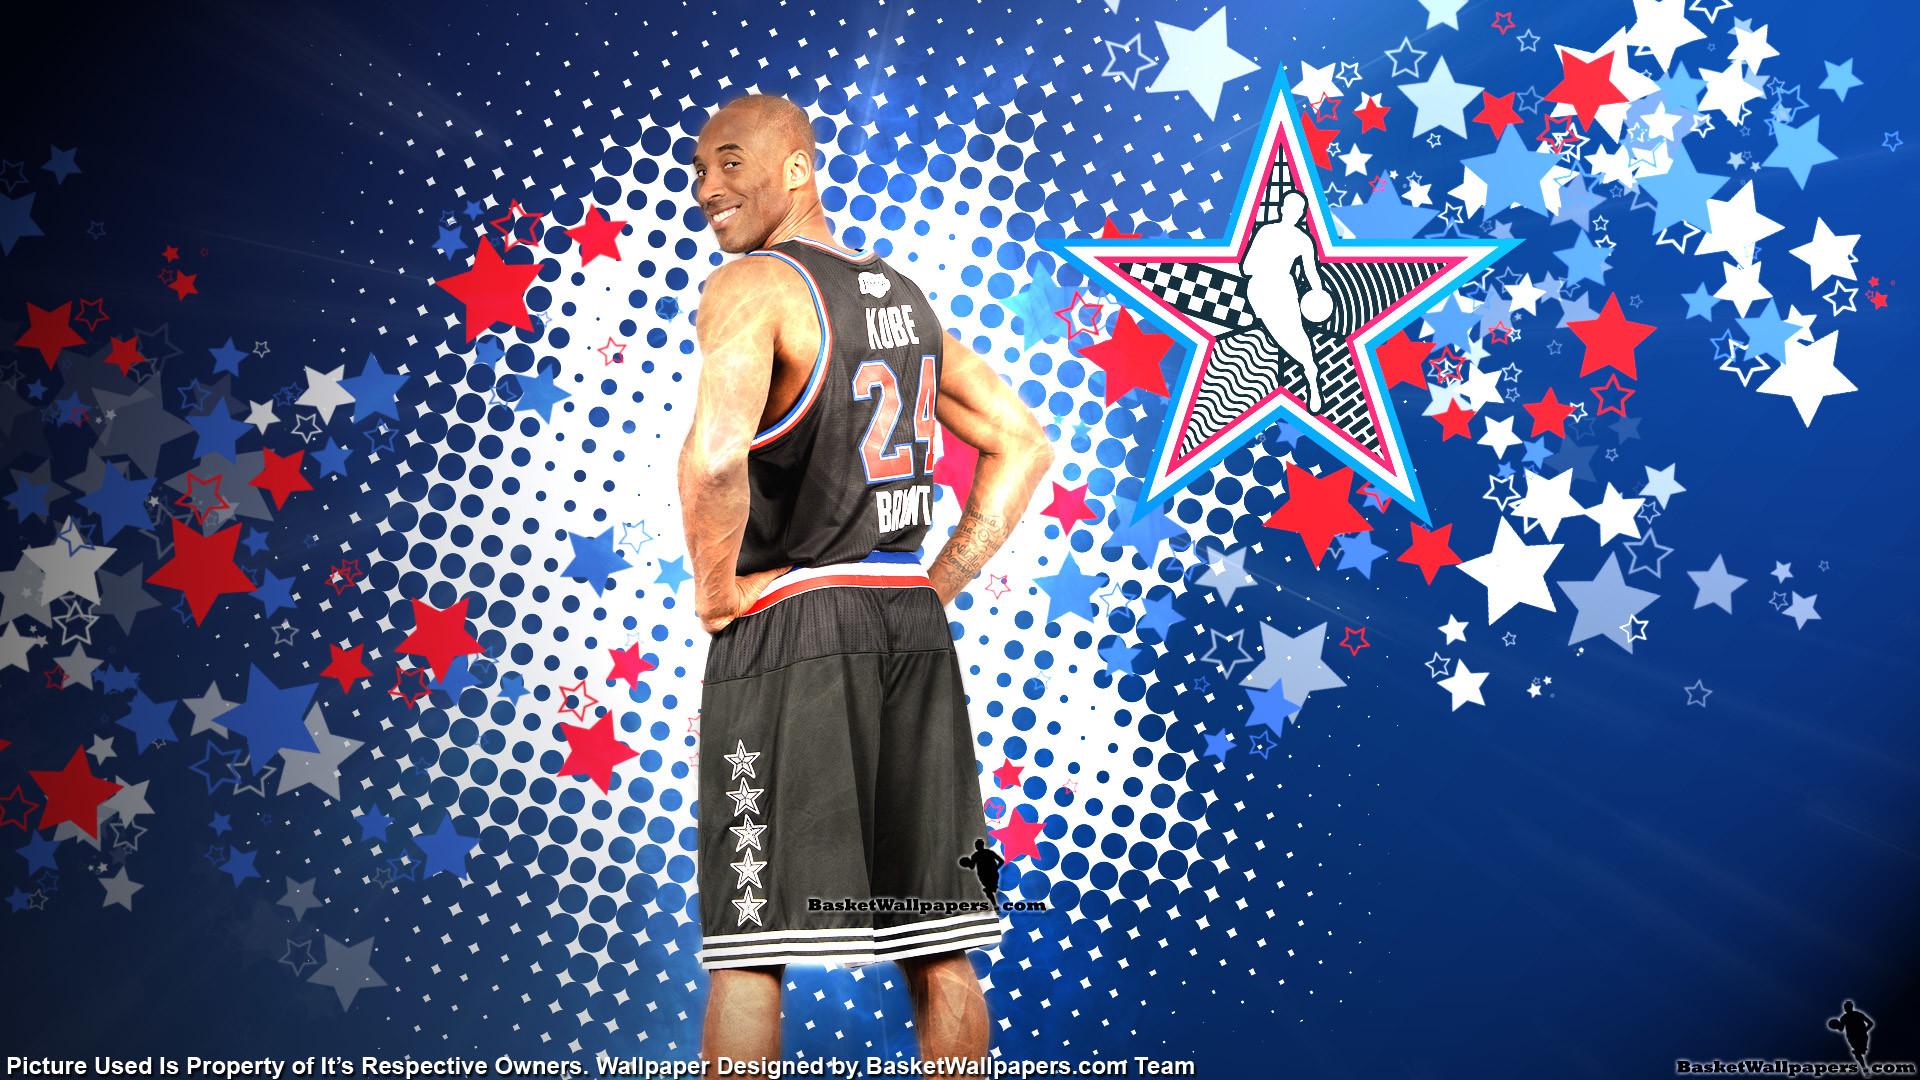 Kobe Bryant 2015 NBA All-Star Wallpaper